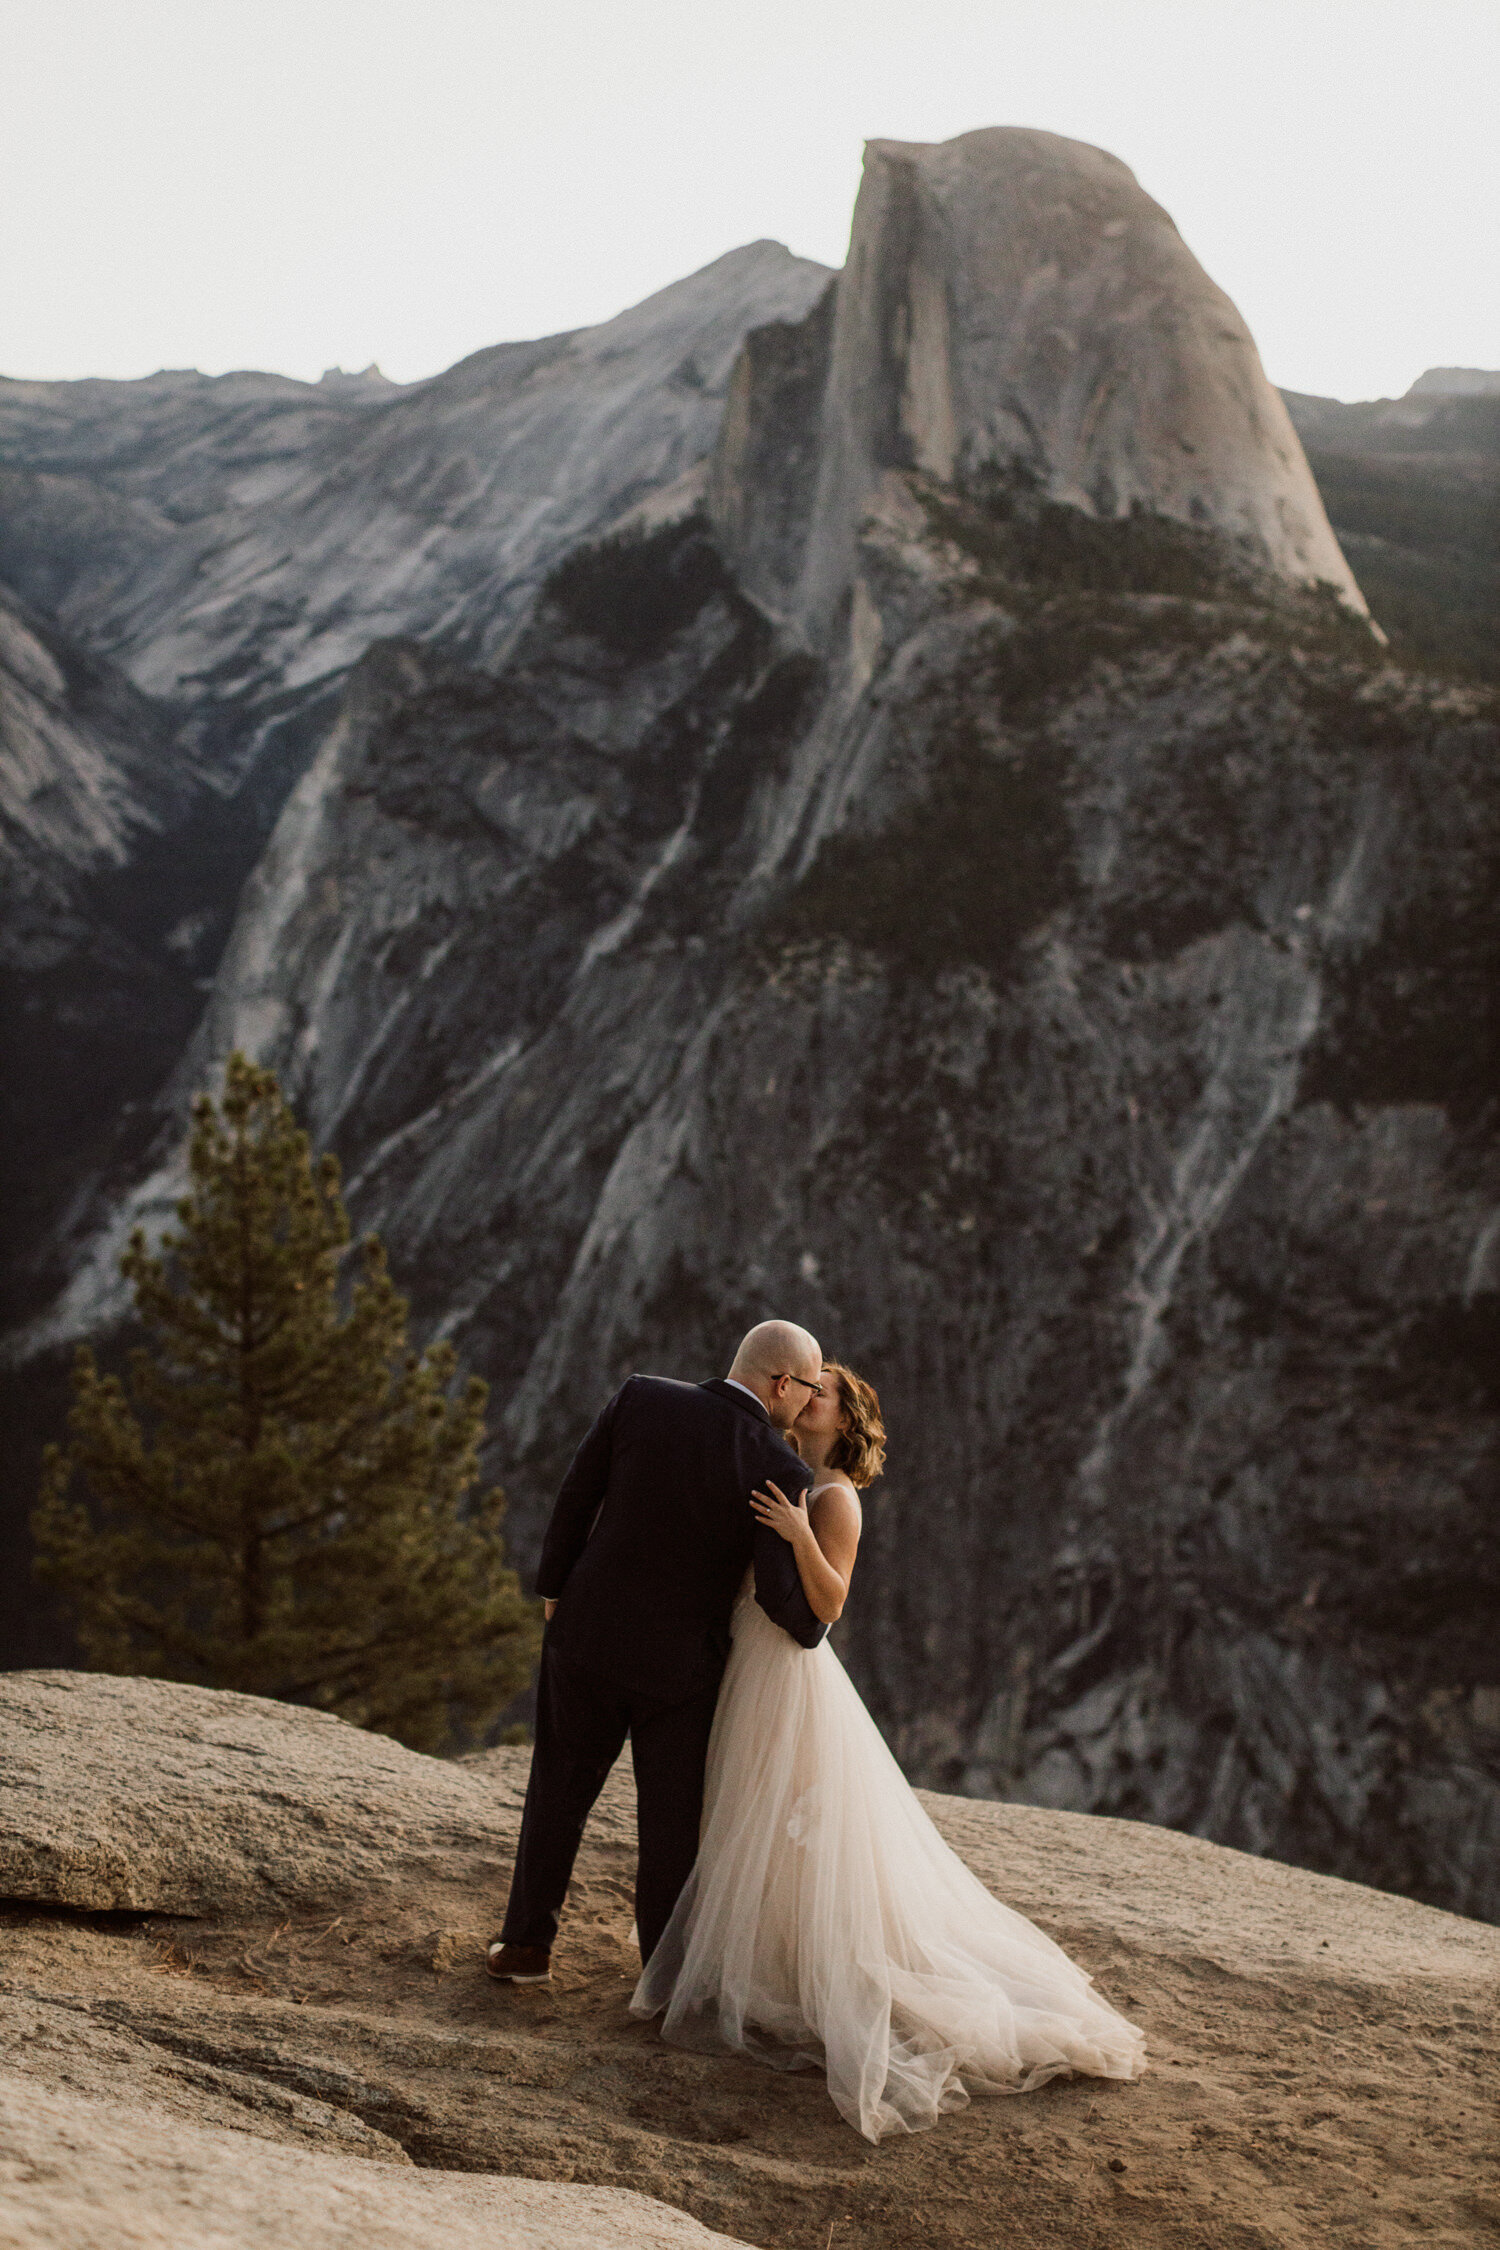 adventure-wedding-yosemite-national-park-4.jpg